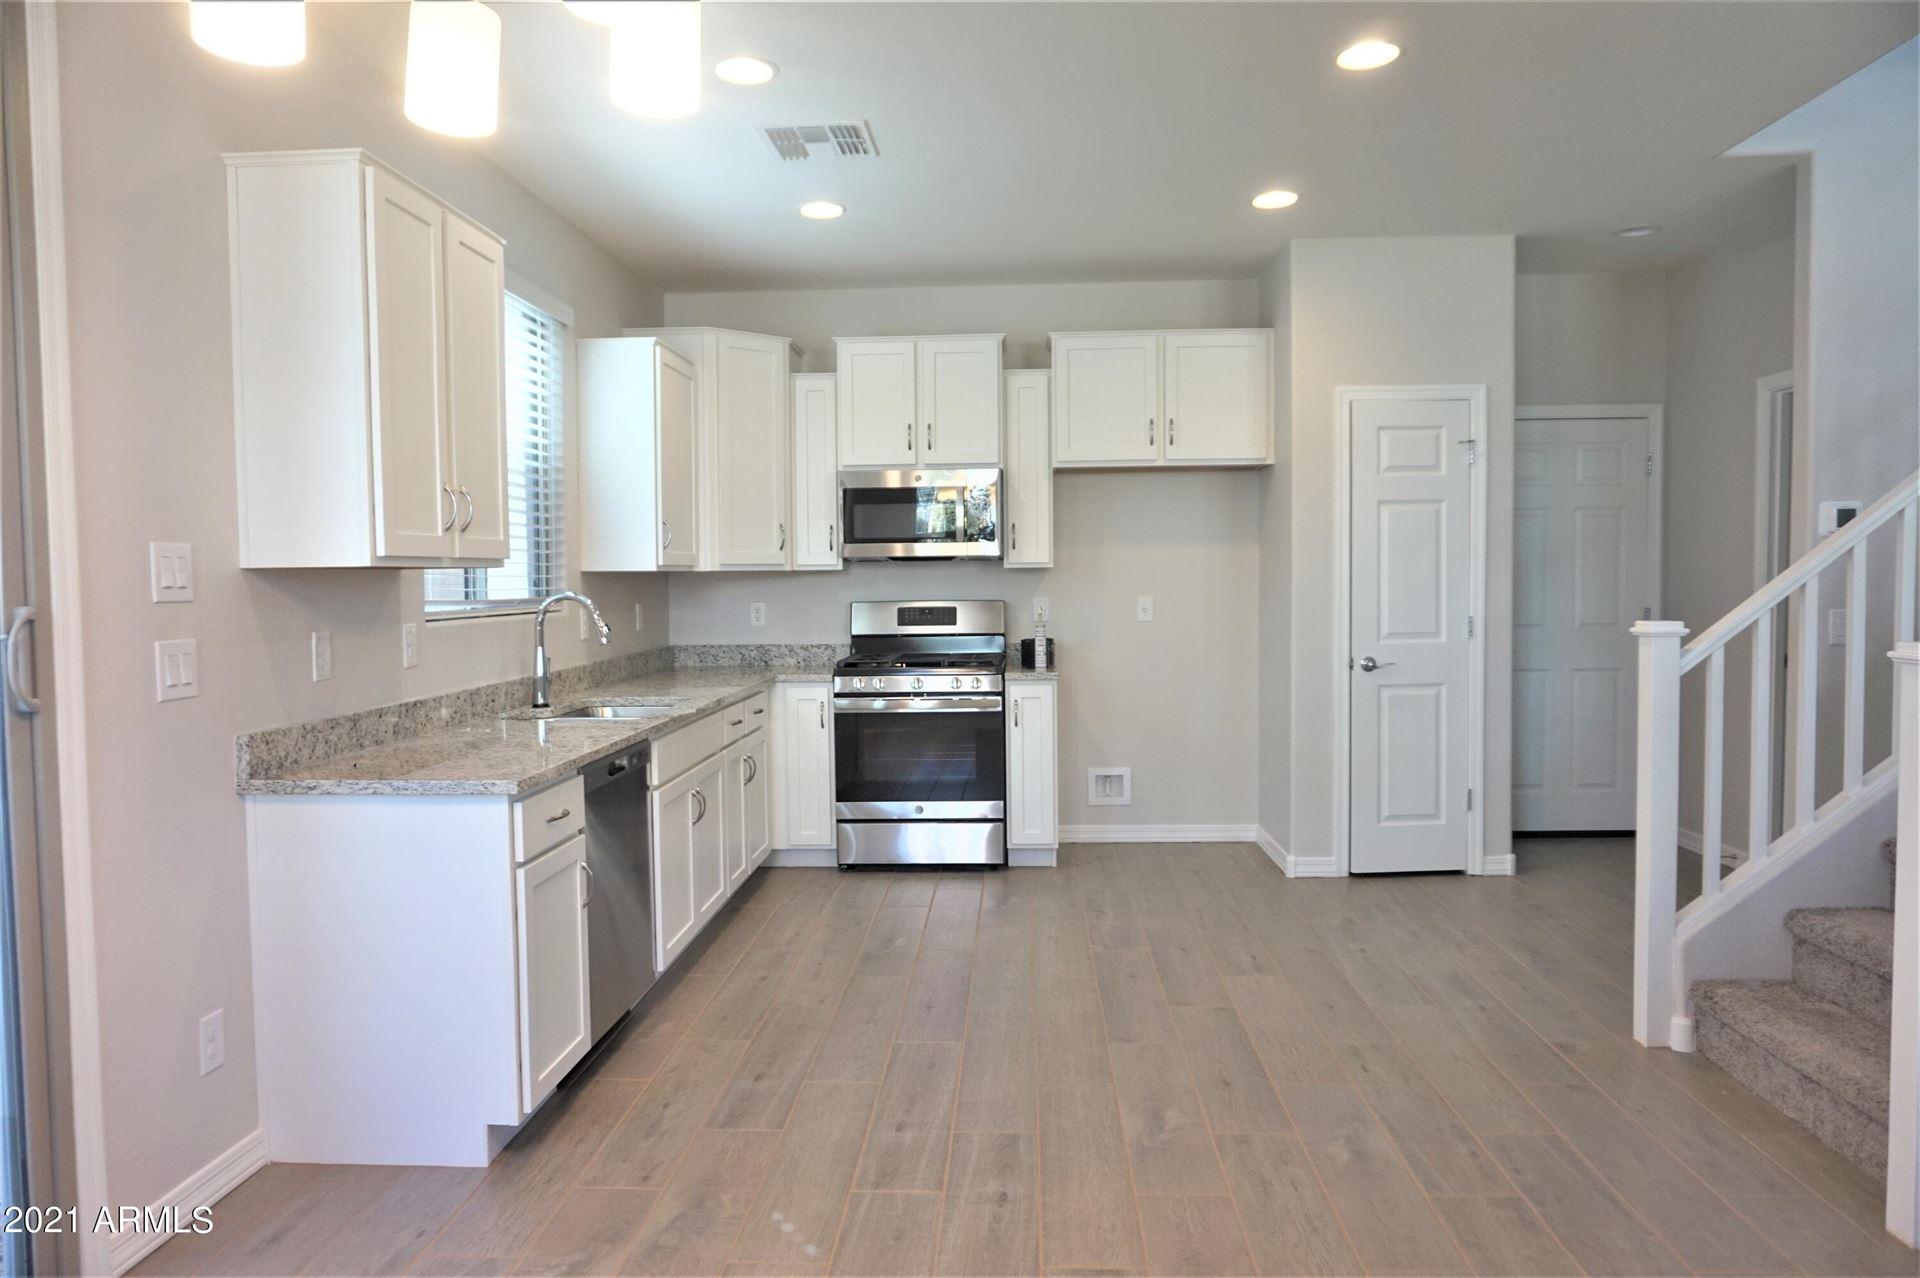 Photo of 1651 S 83rd Place, Mesa, AZ 85209 (MLS # 6296723)